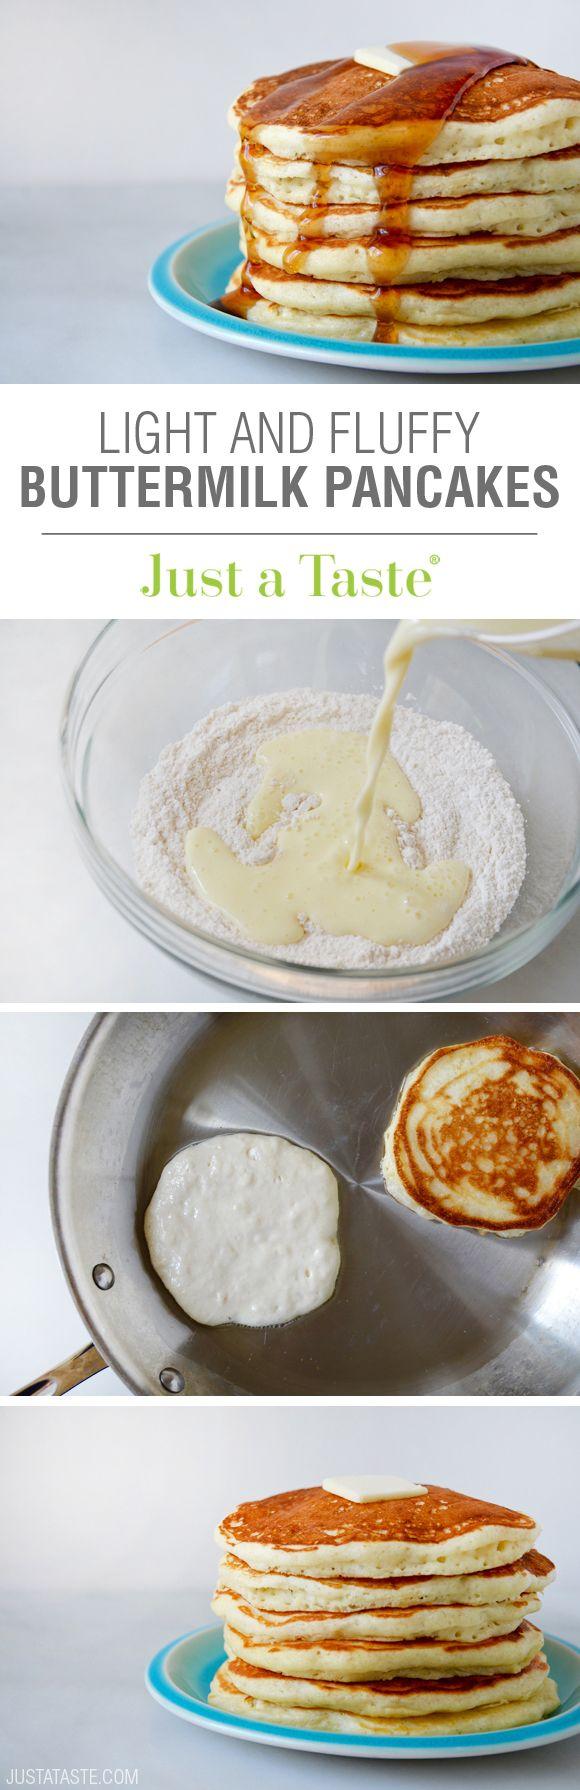 Light and Fluffy Buttermilk Pancakes #recipe via justataste.com